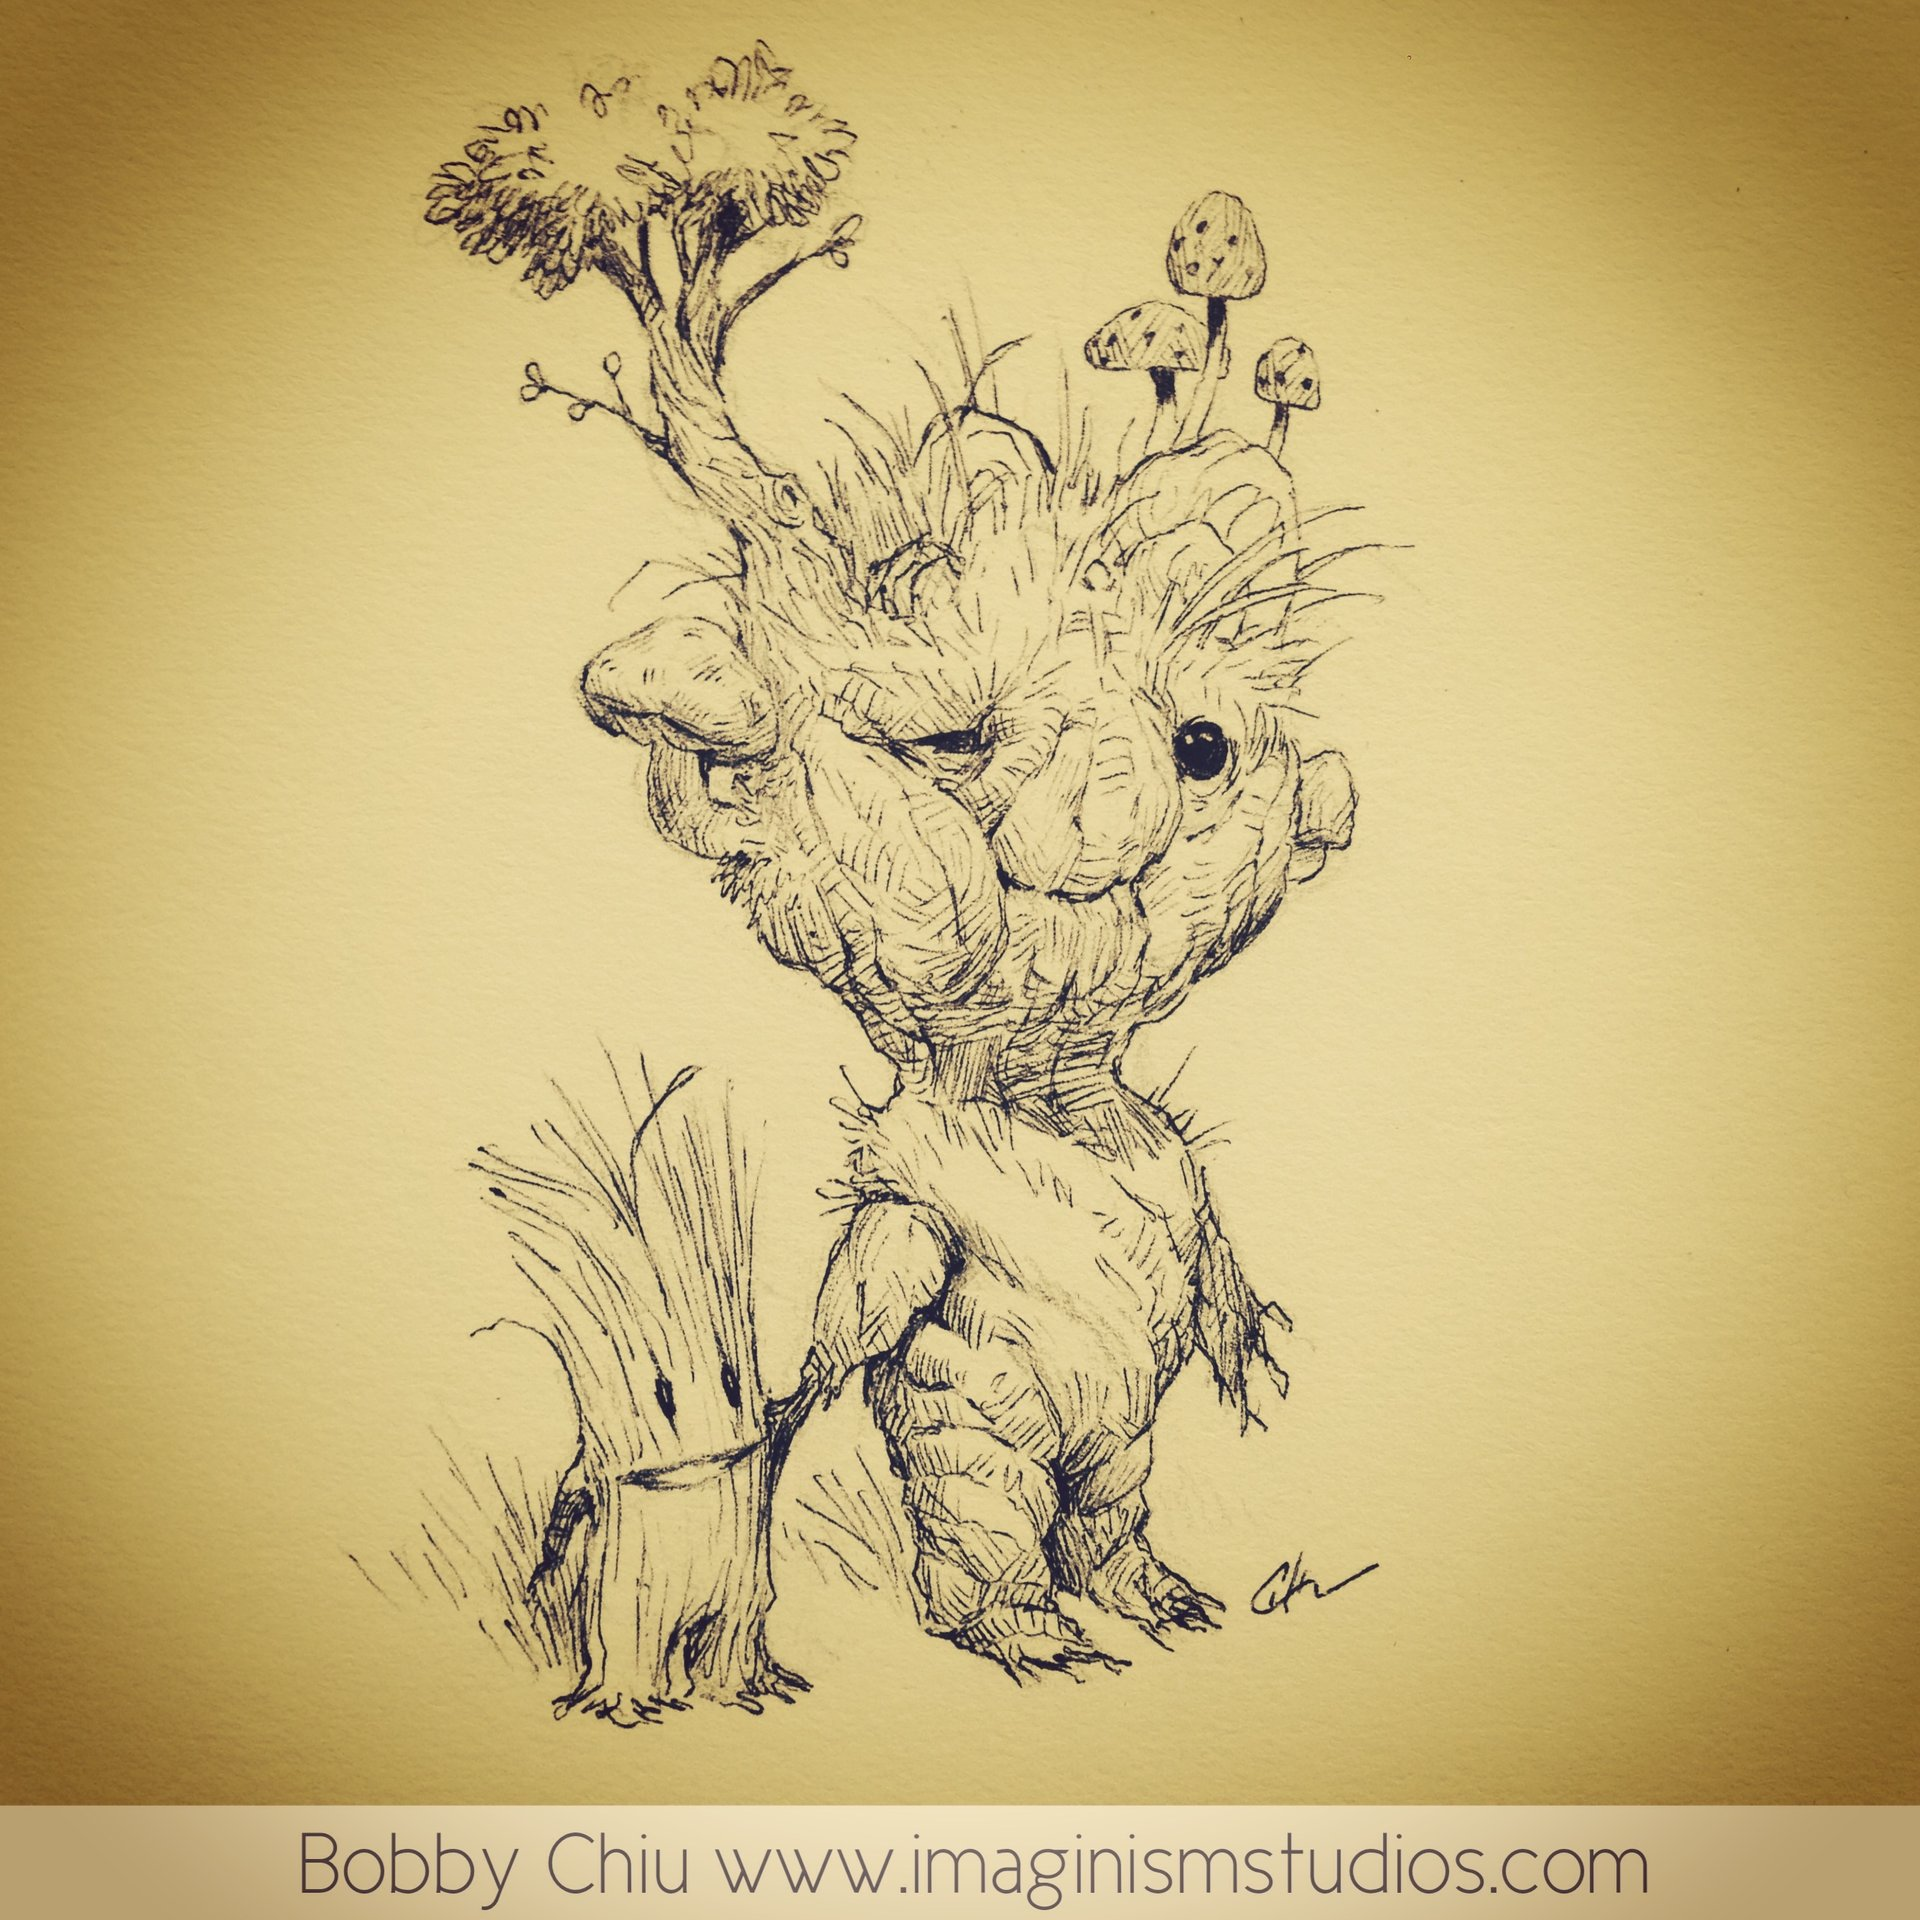 bobby-chiu-forest-friends-by-imaginism-d72ym91.jpg